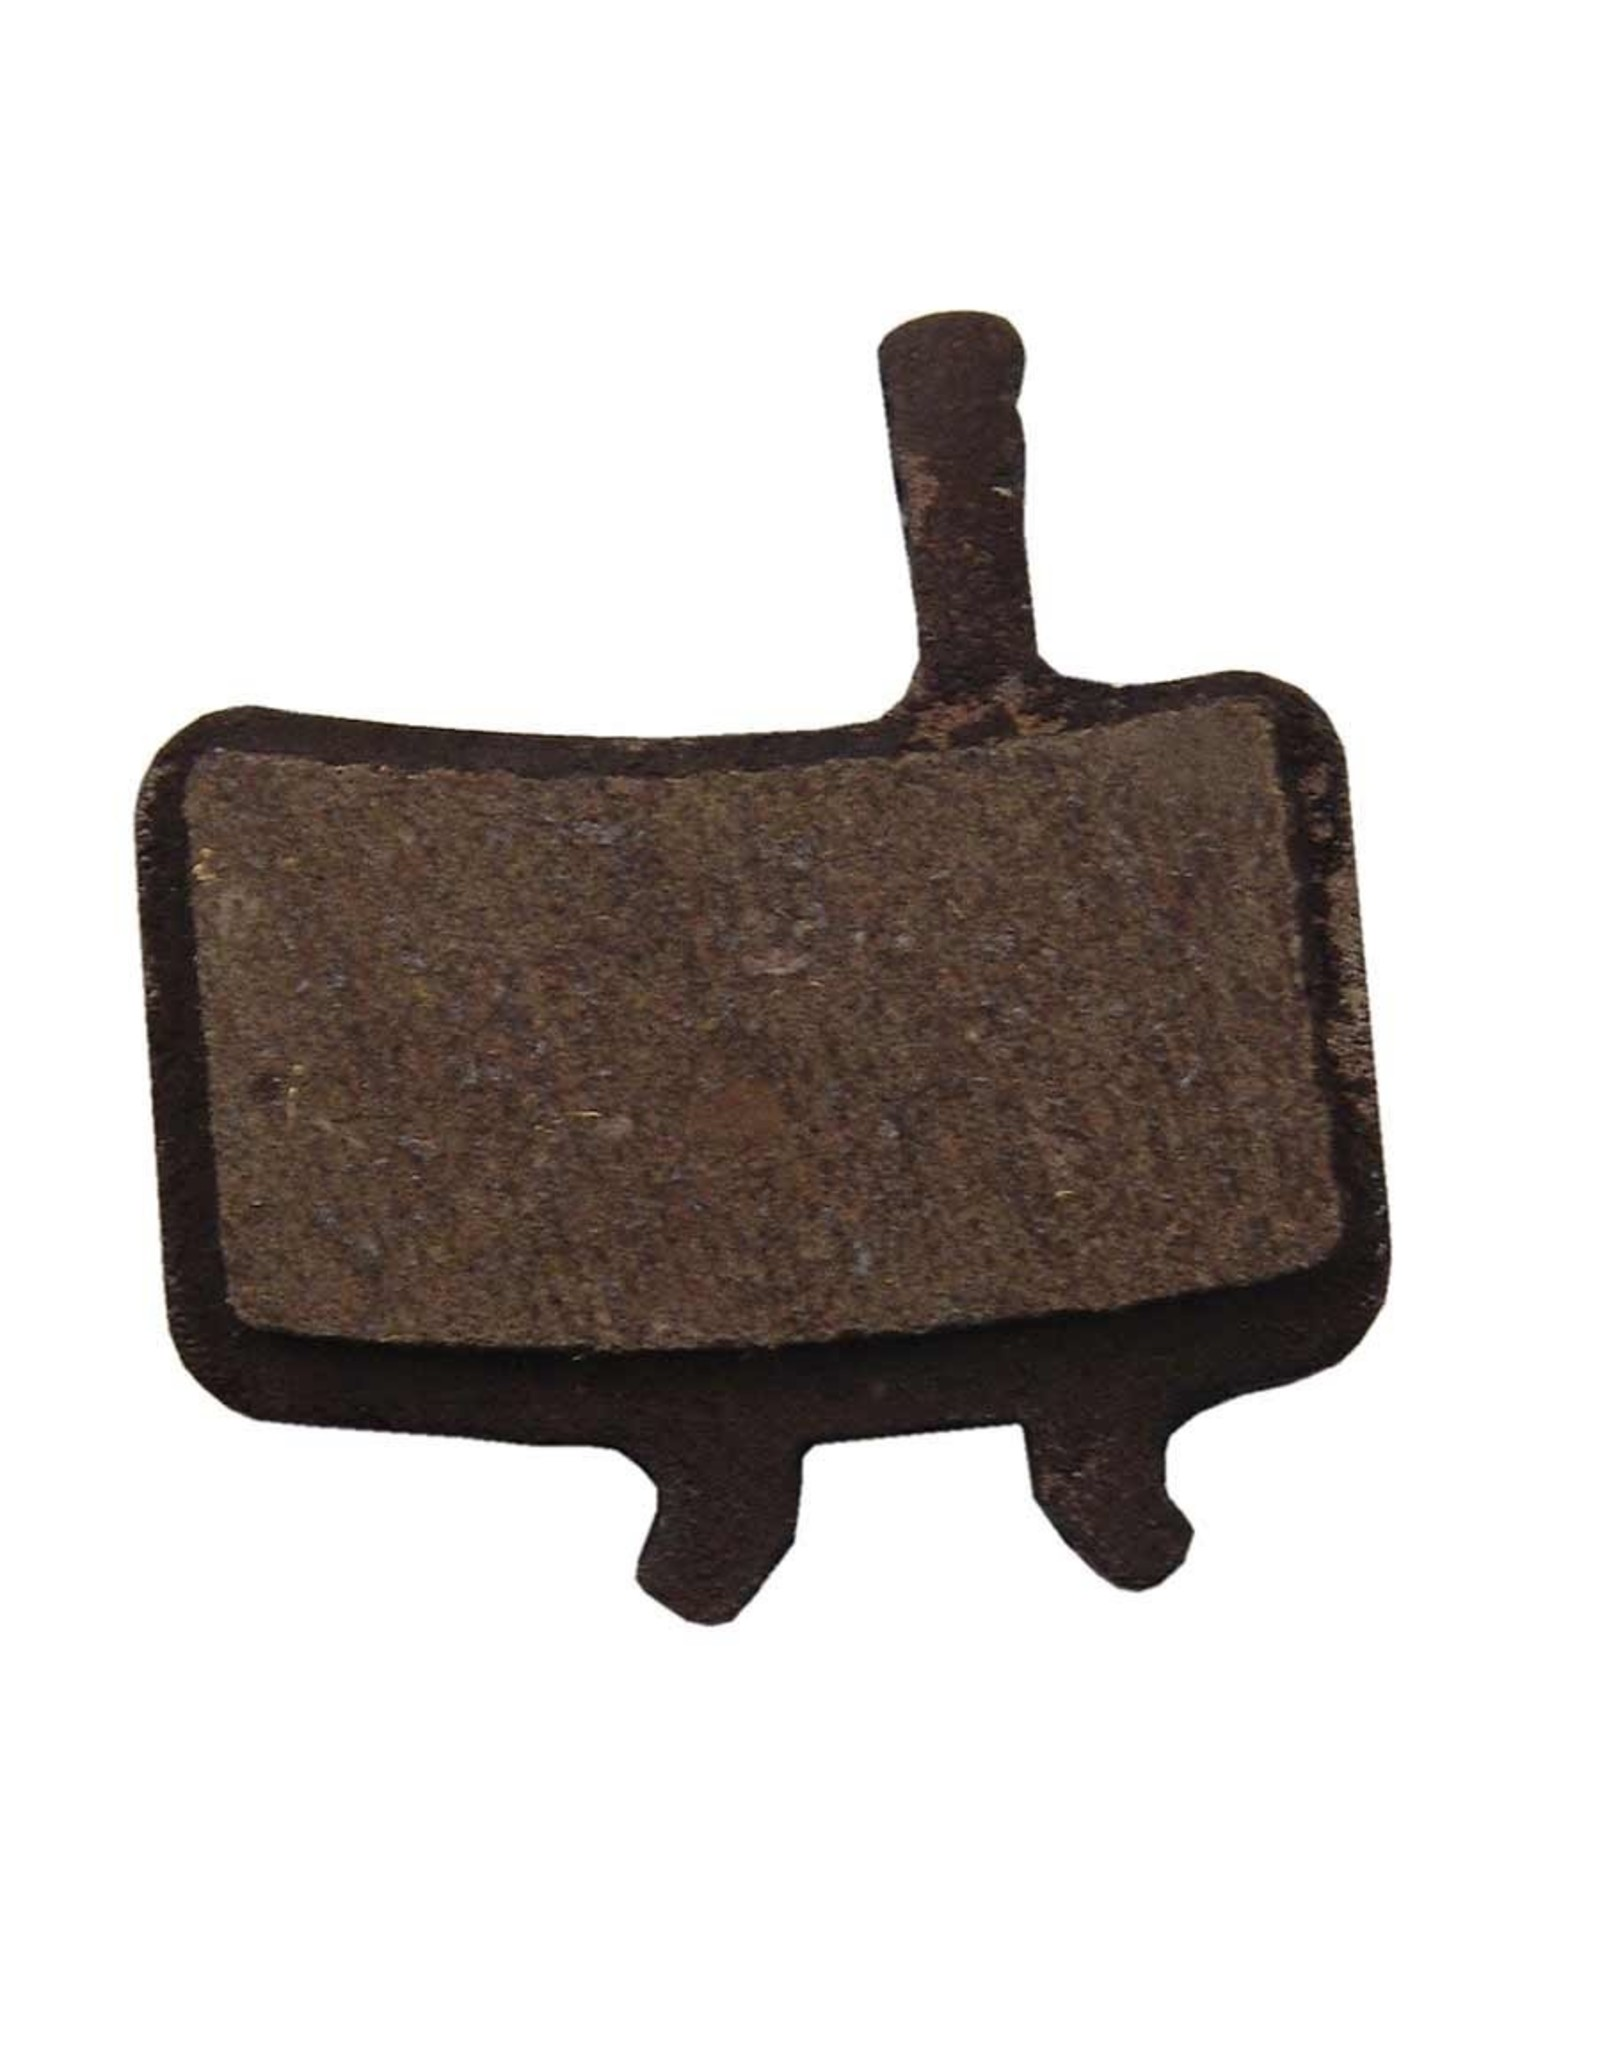 AVID Avid - Juicy & BB7, Disc brake pads, organic (Quiet), Steel back plate, pair